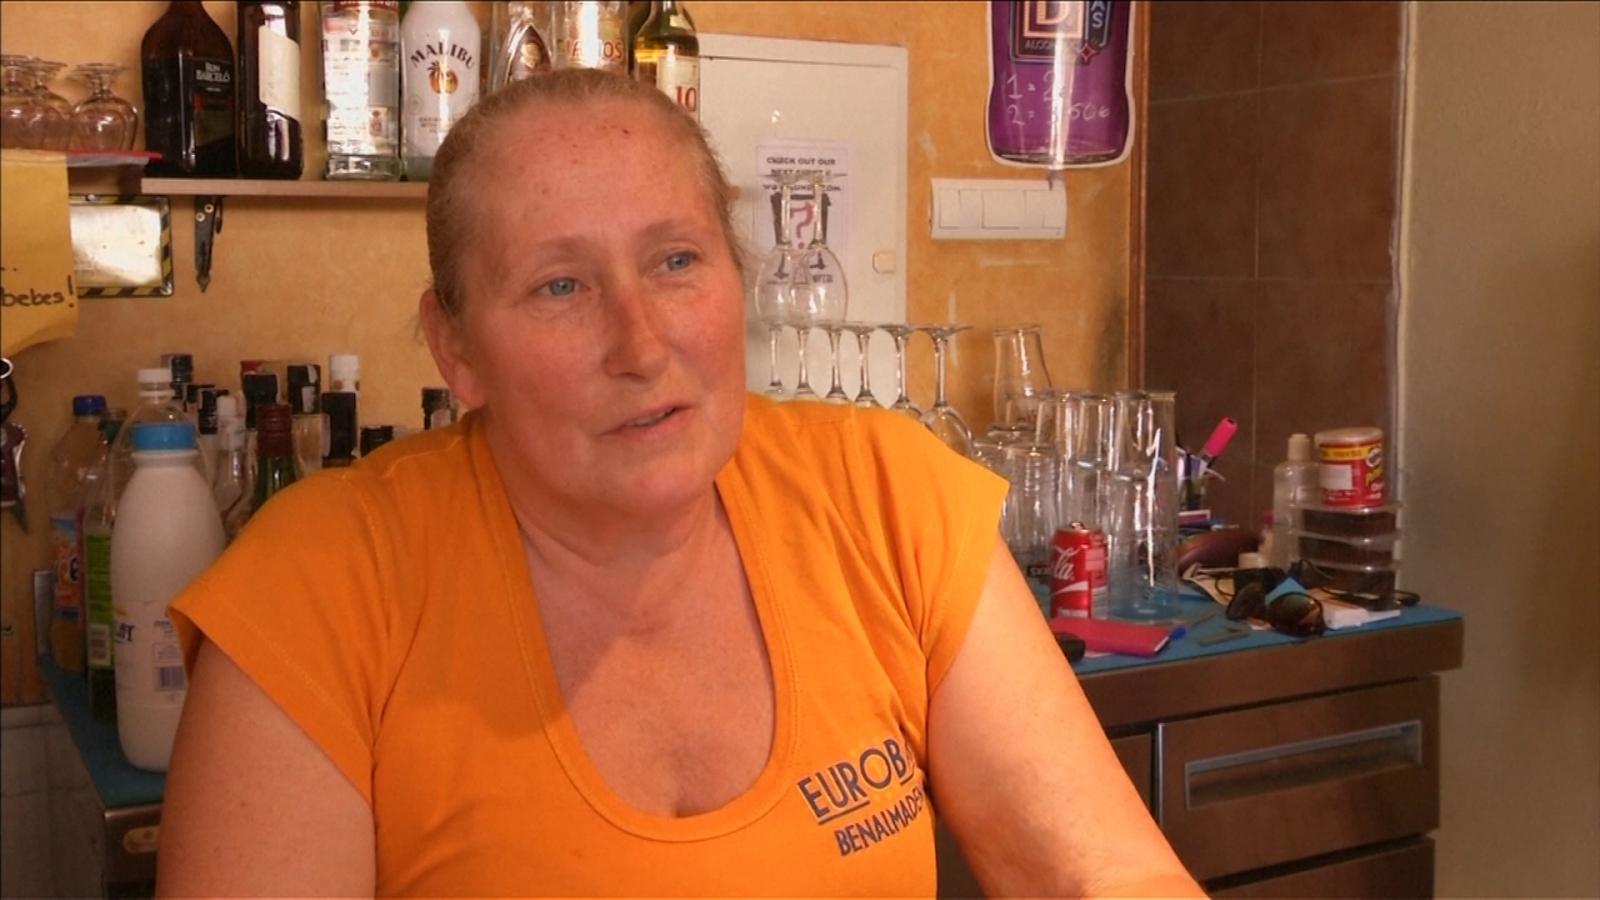 Joanne Rimmer, Owener of the Euro Bar